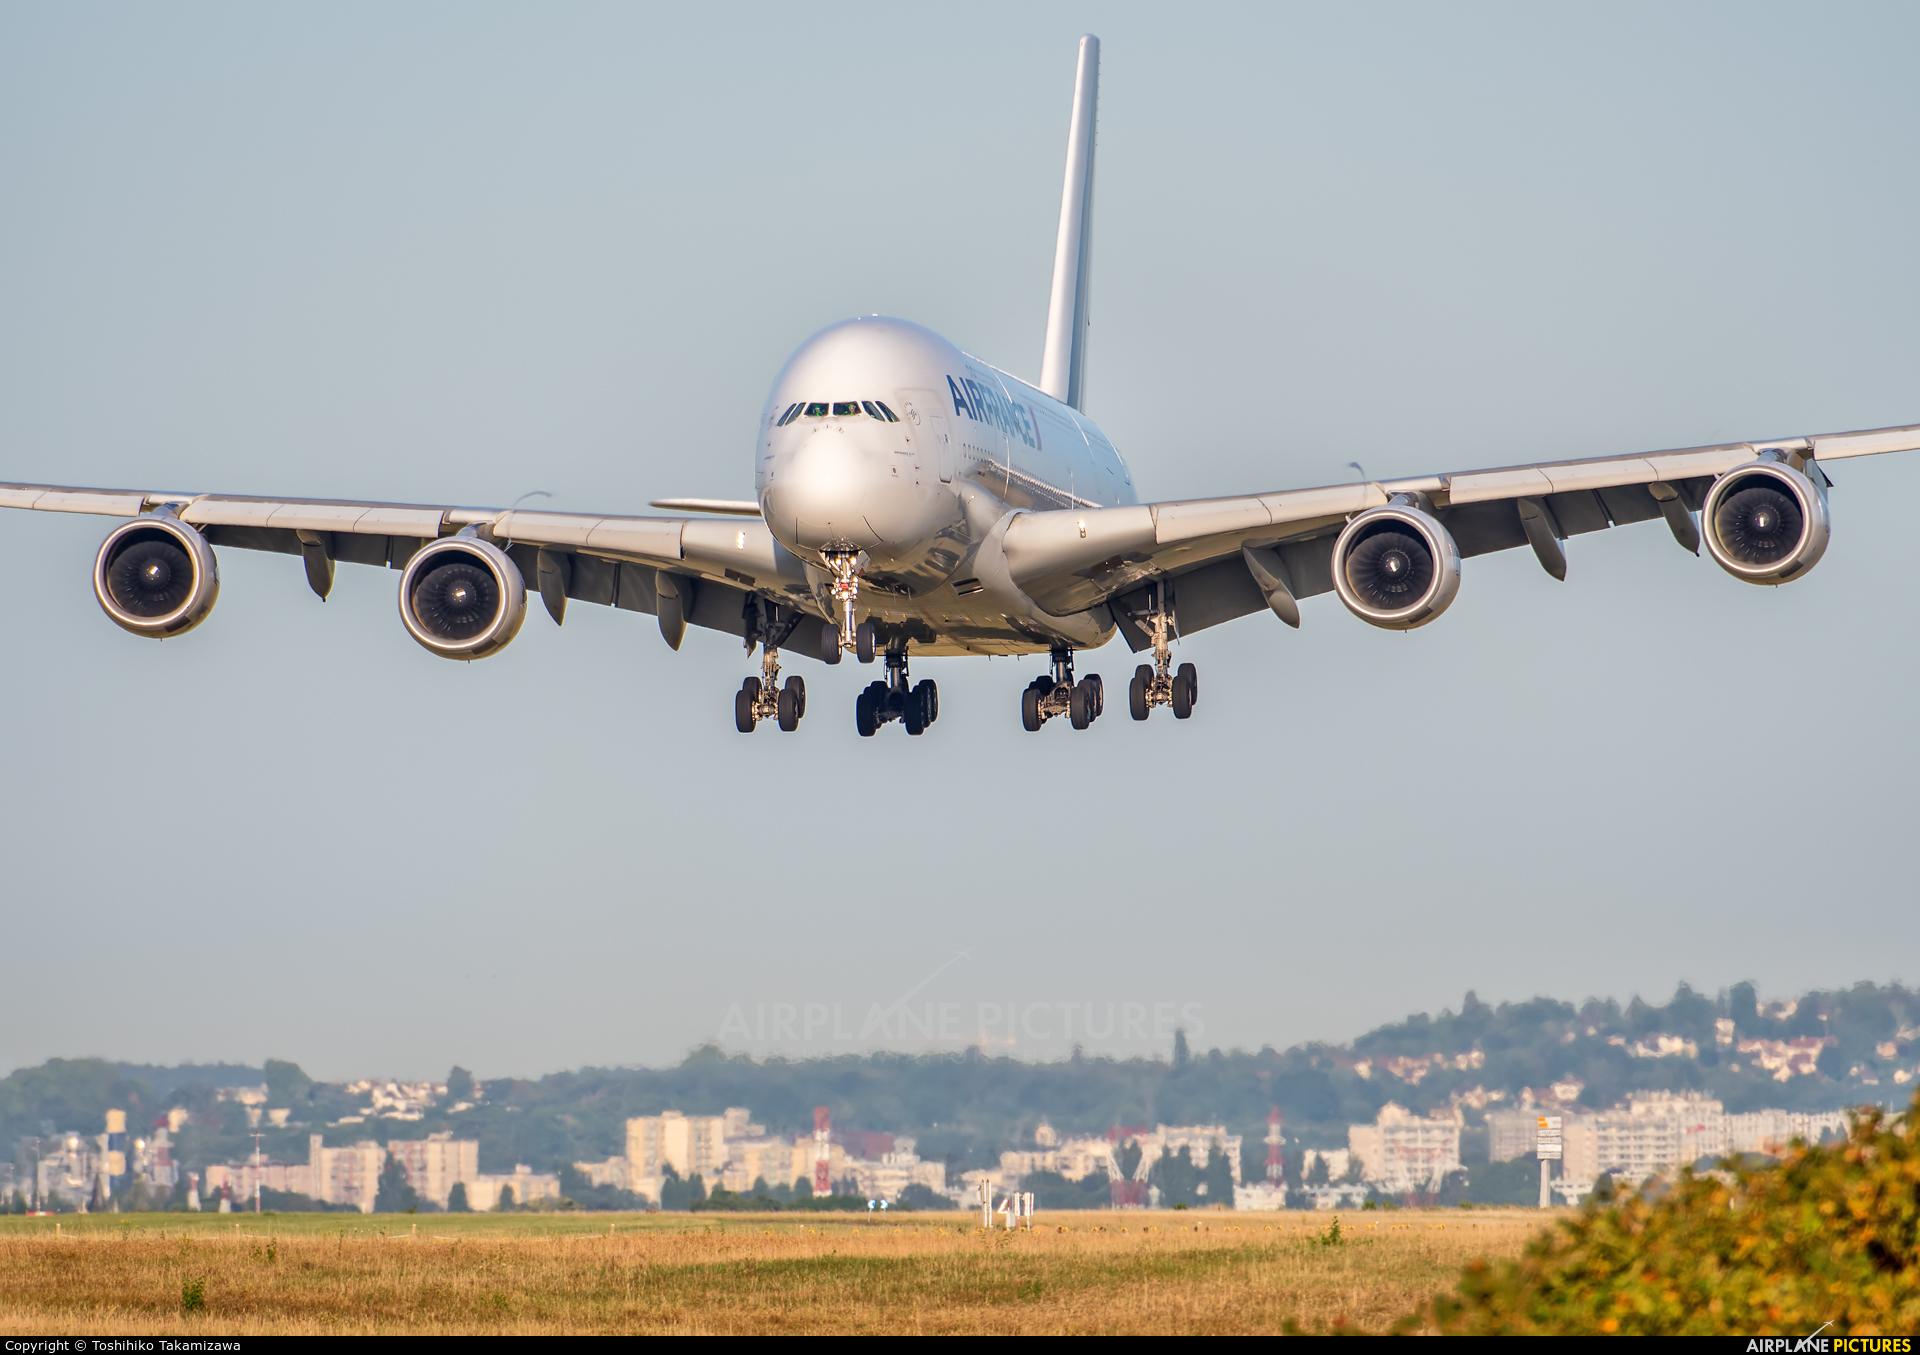 Air France F-HPJC aircraft at Paris - Charles de Gaulle